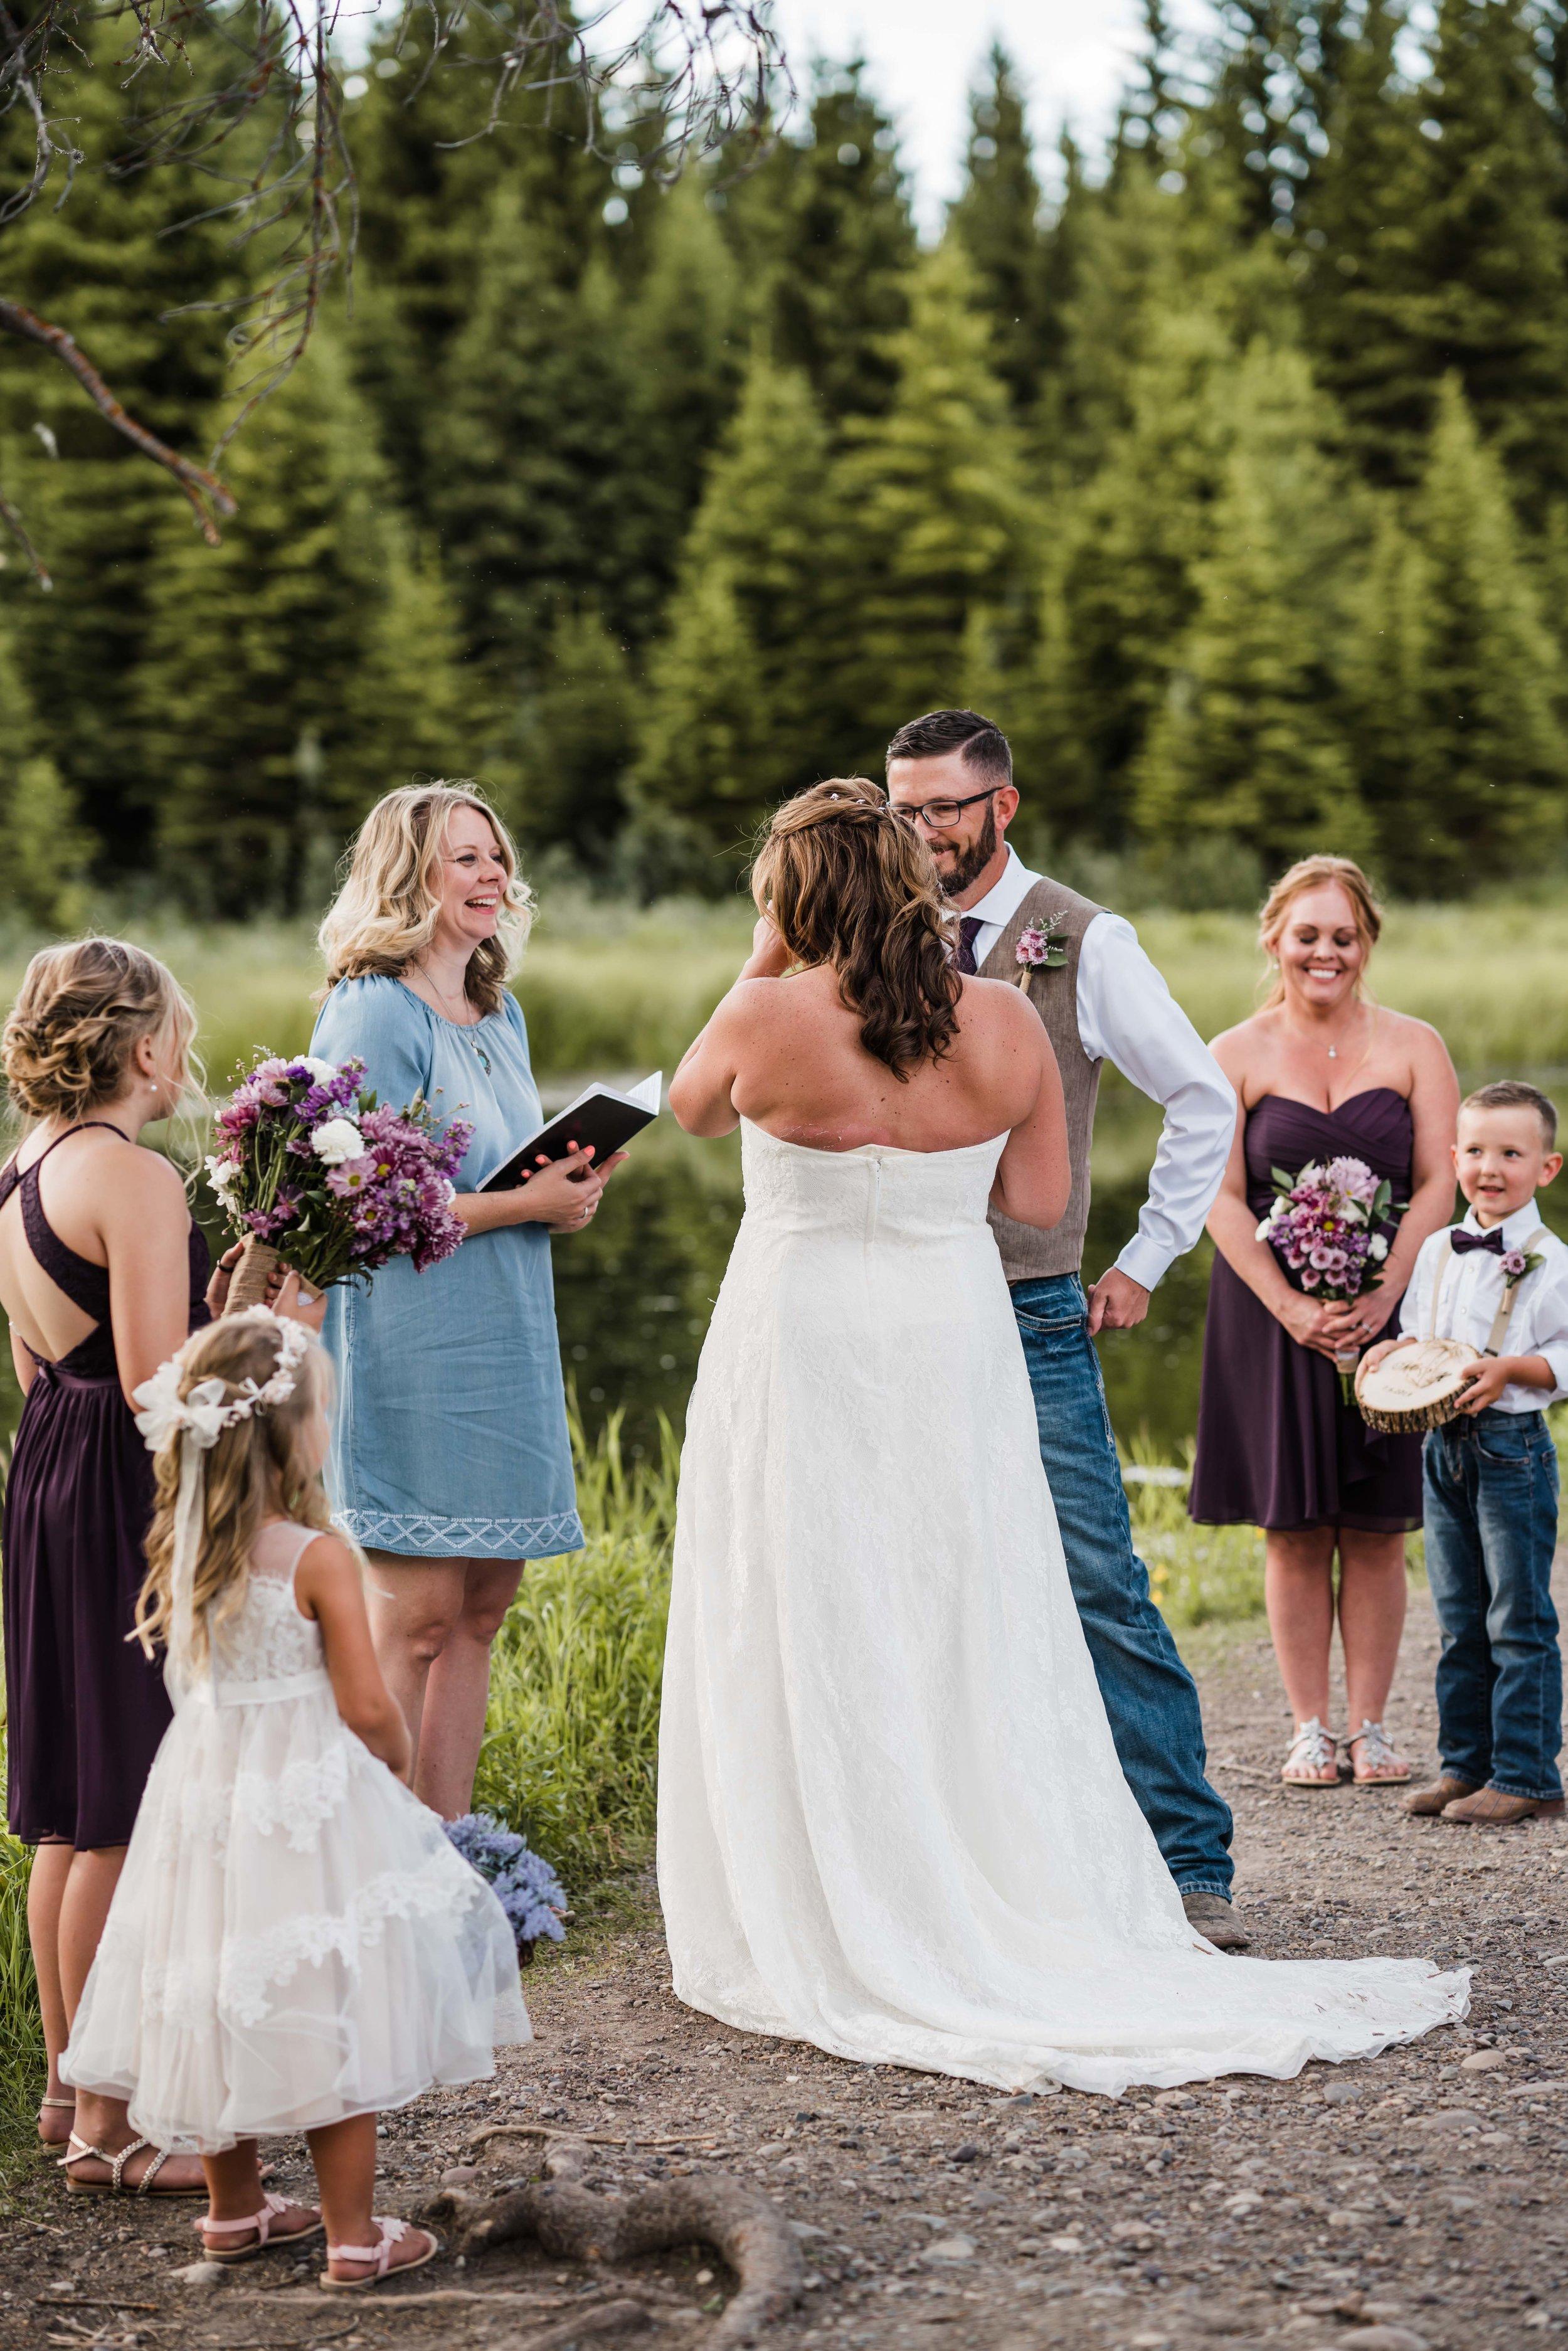 jackson hole adventure wedding photography at schwabachers landing in GTNP -DSC03784.jpg